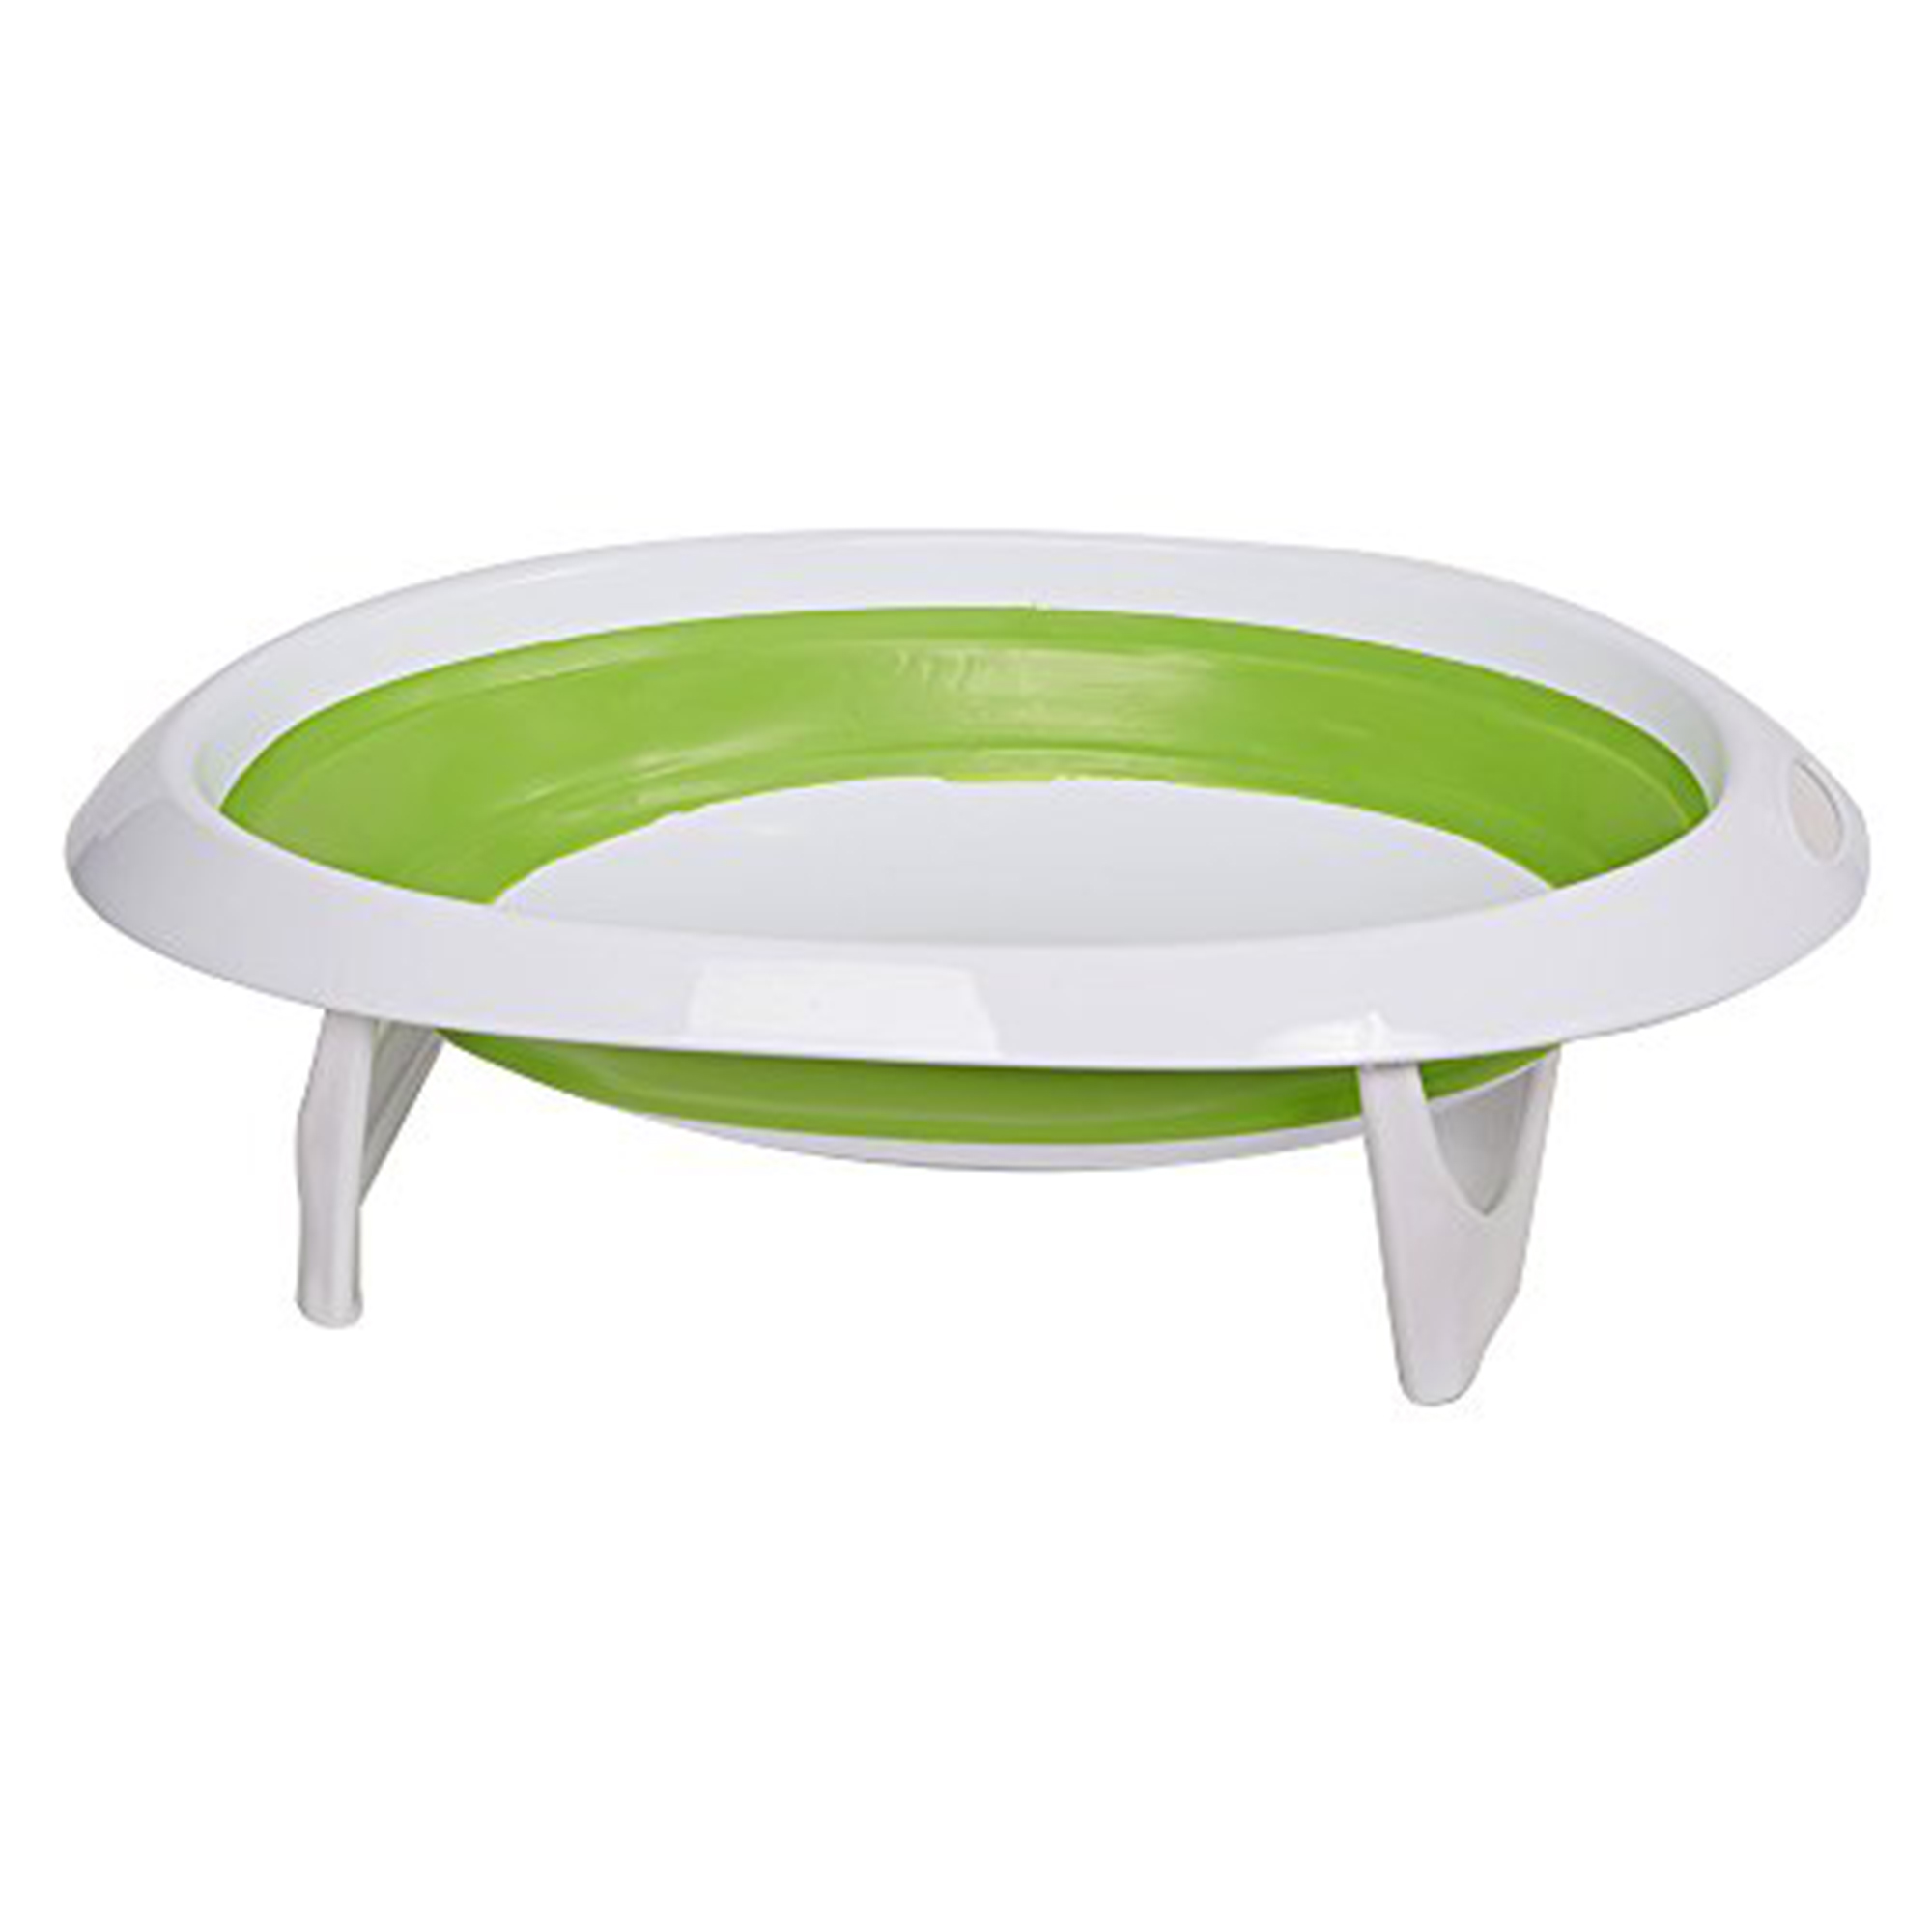 KARMAS PRODUCT Infant EasyStore Comfort Tub Soft Foldable Newborn Bathtub Green by KARMAS PRODUCT